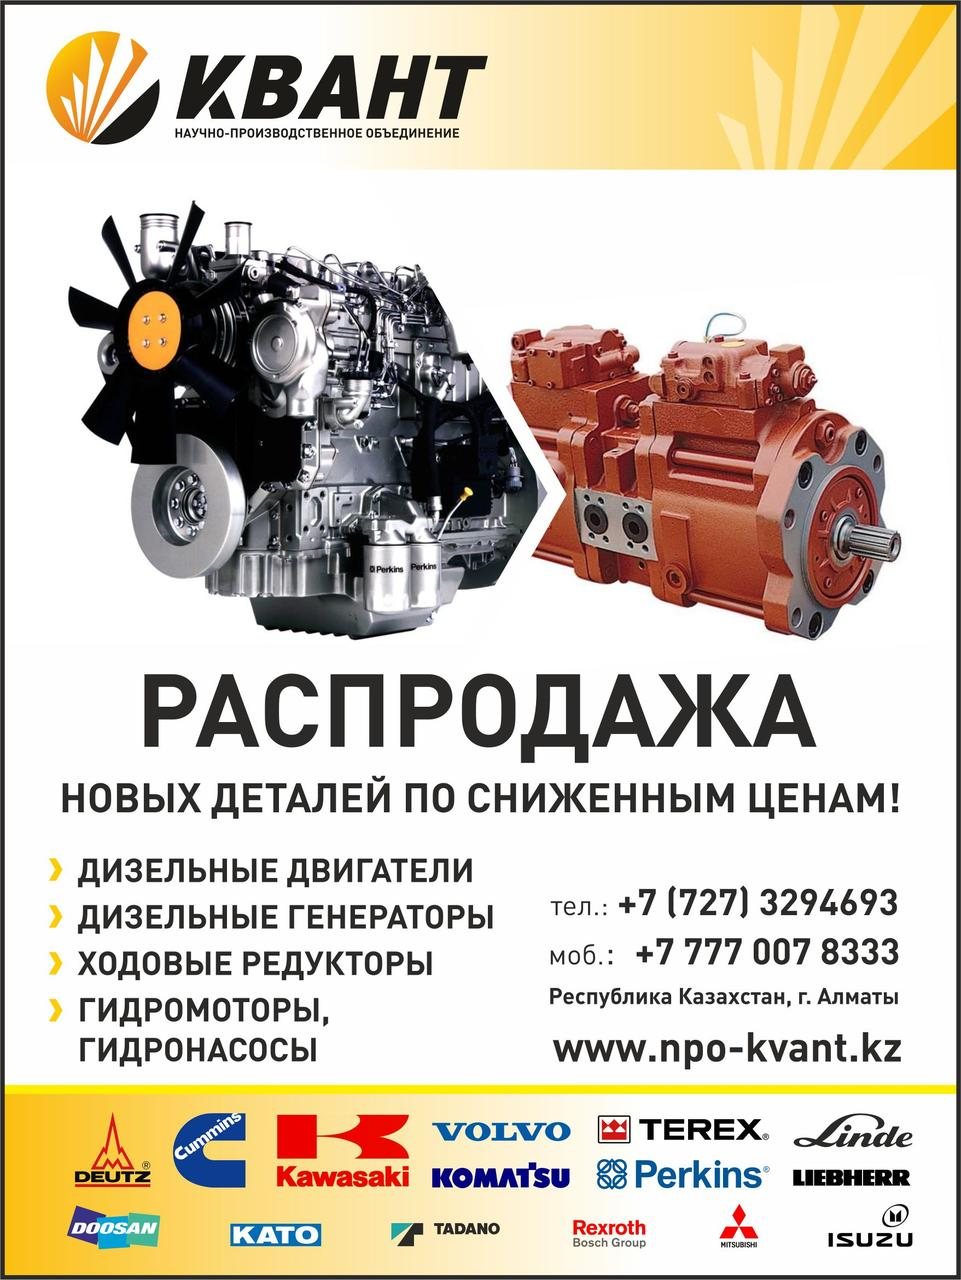 Двигатель Iveco F4AE3481D*R102, Iveco F4AE3481D*R103, Iveco F4AE3681A*R100, Iveco F4AE3681B*P107